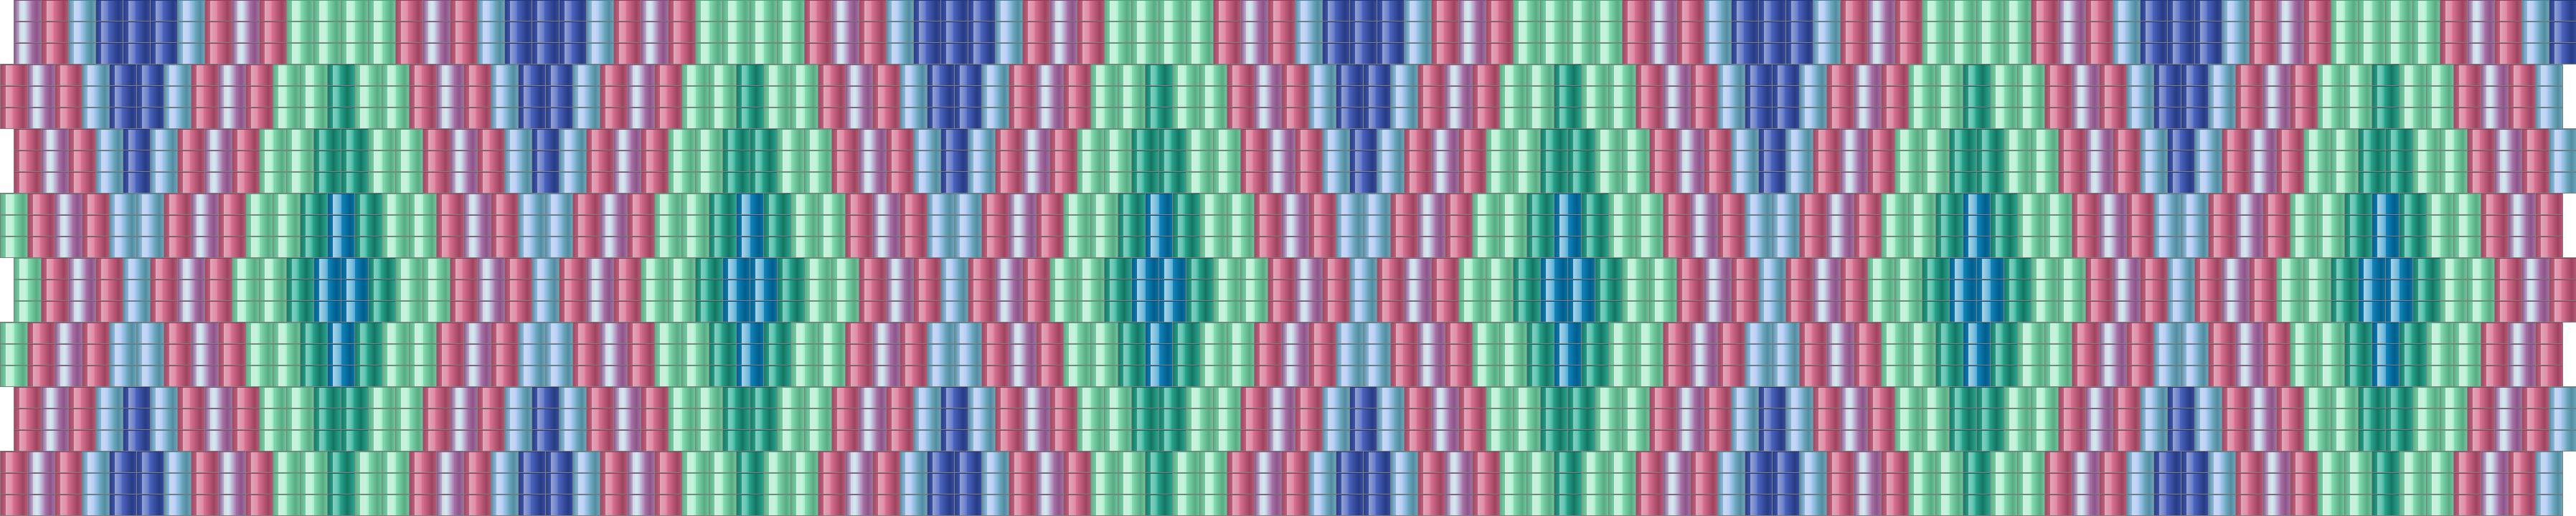 rumba peyote pattern